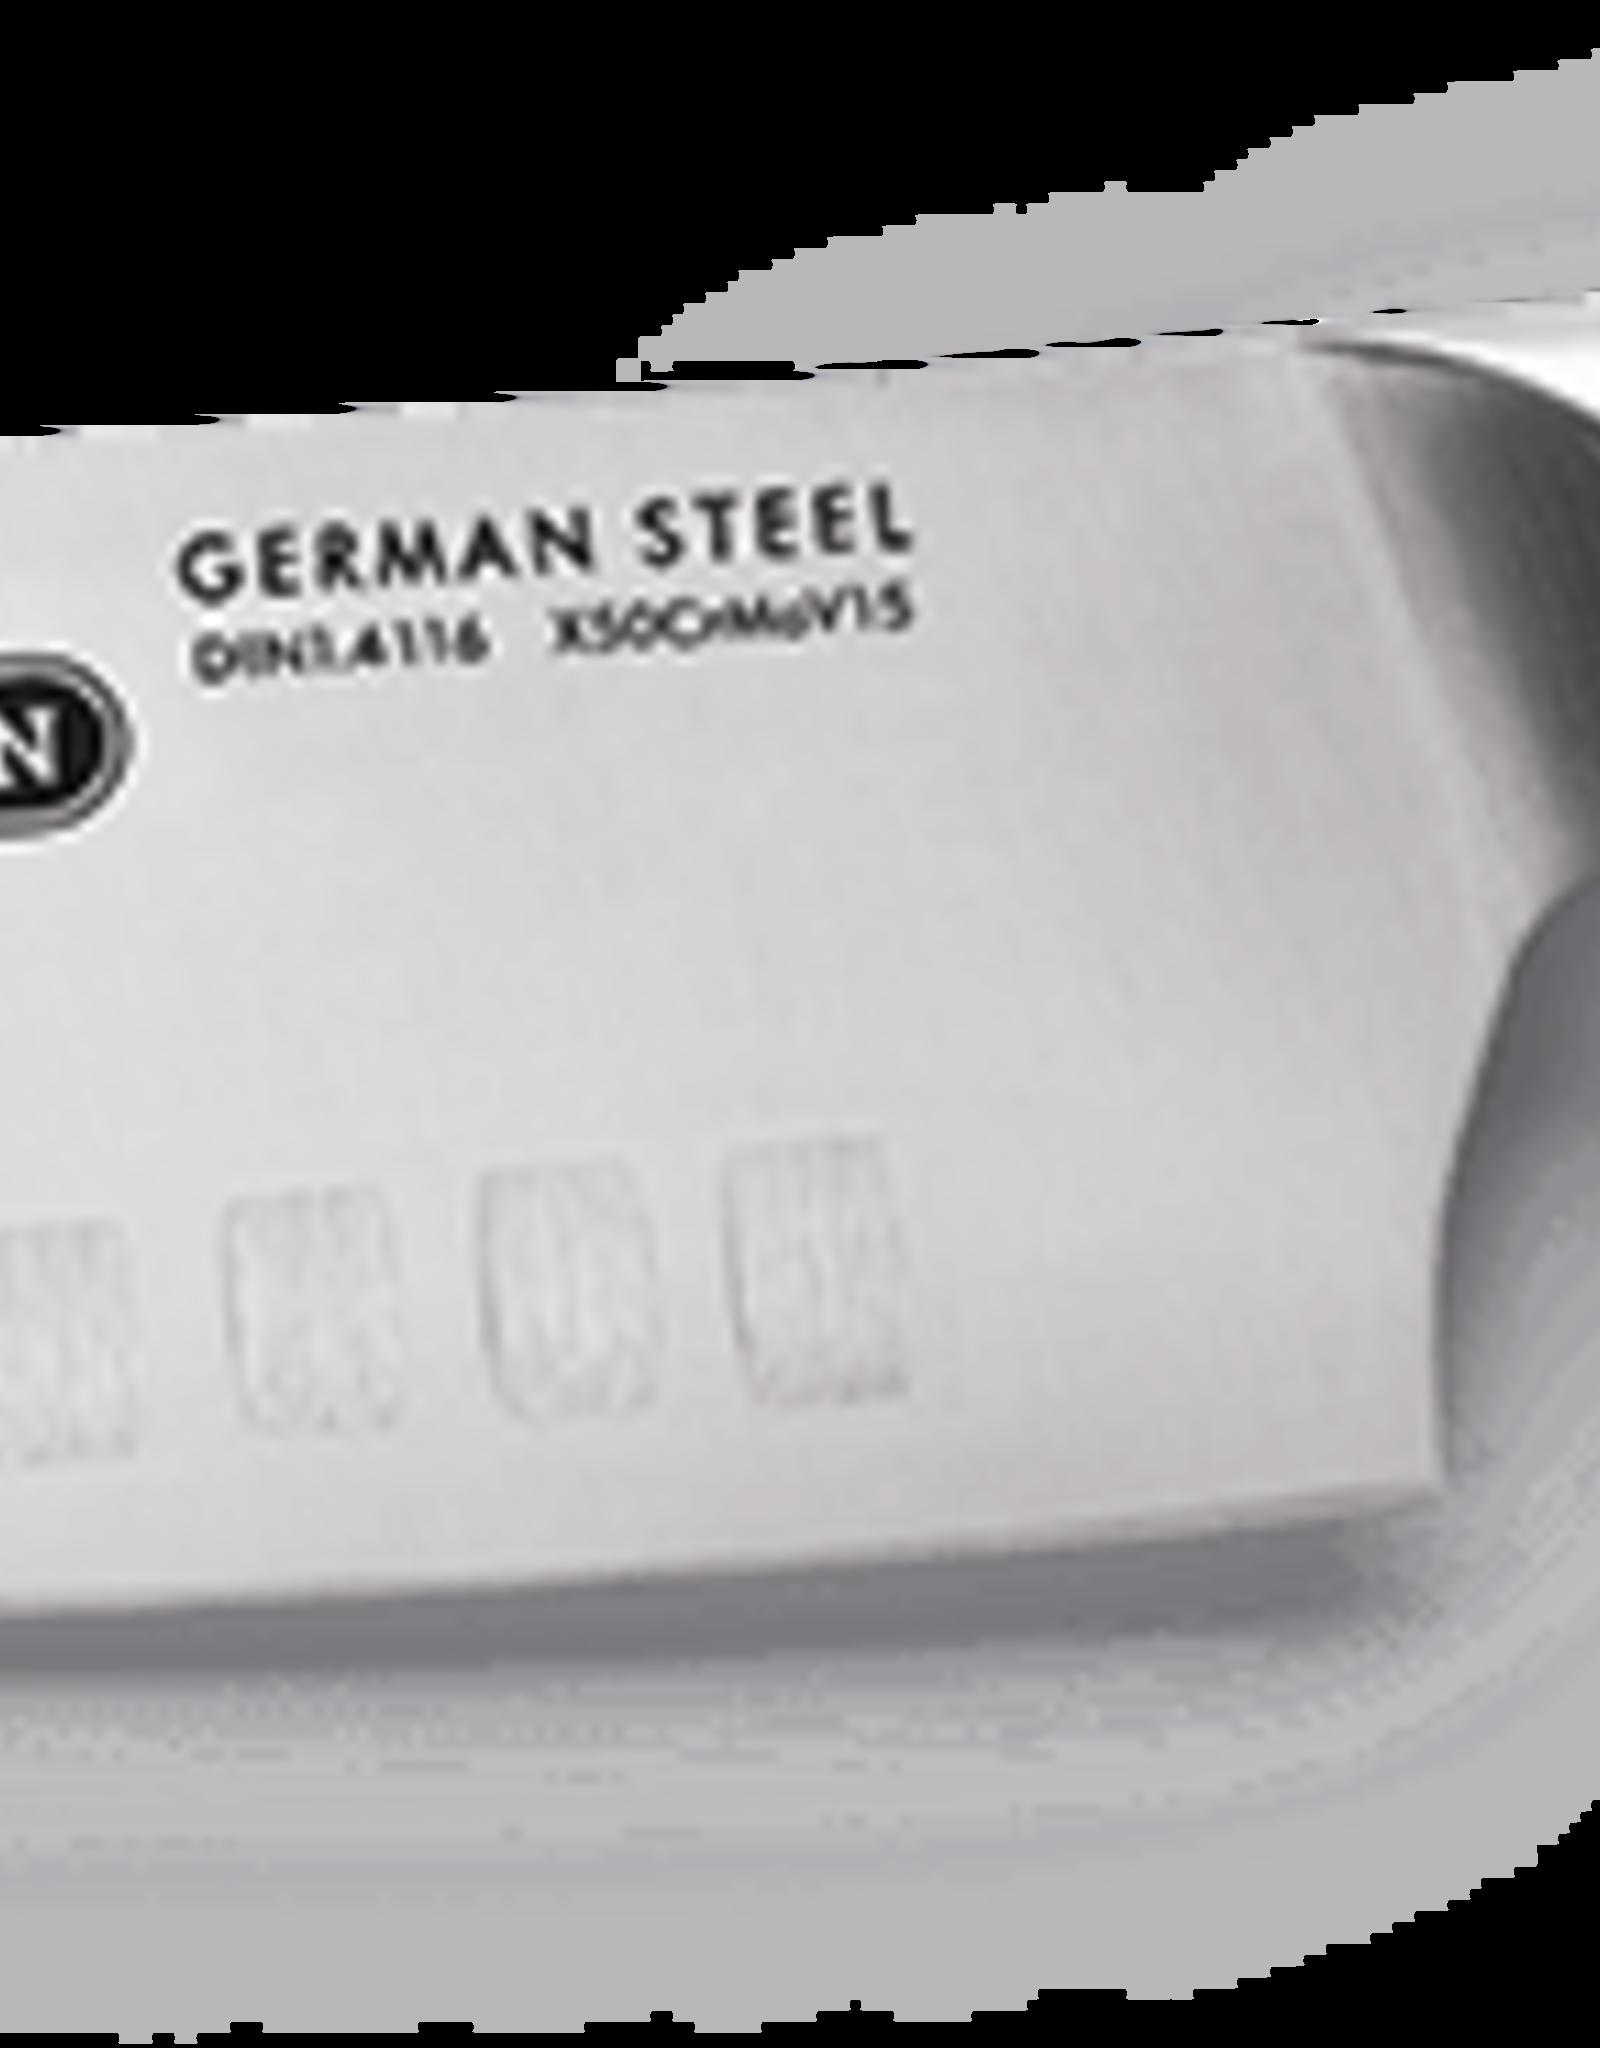 Napoleon Napoleon Santoku Knife with Razor-sharp German Steel - 55212